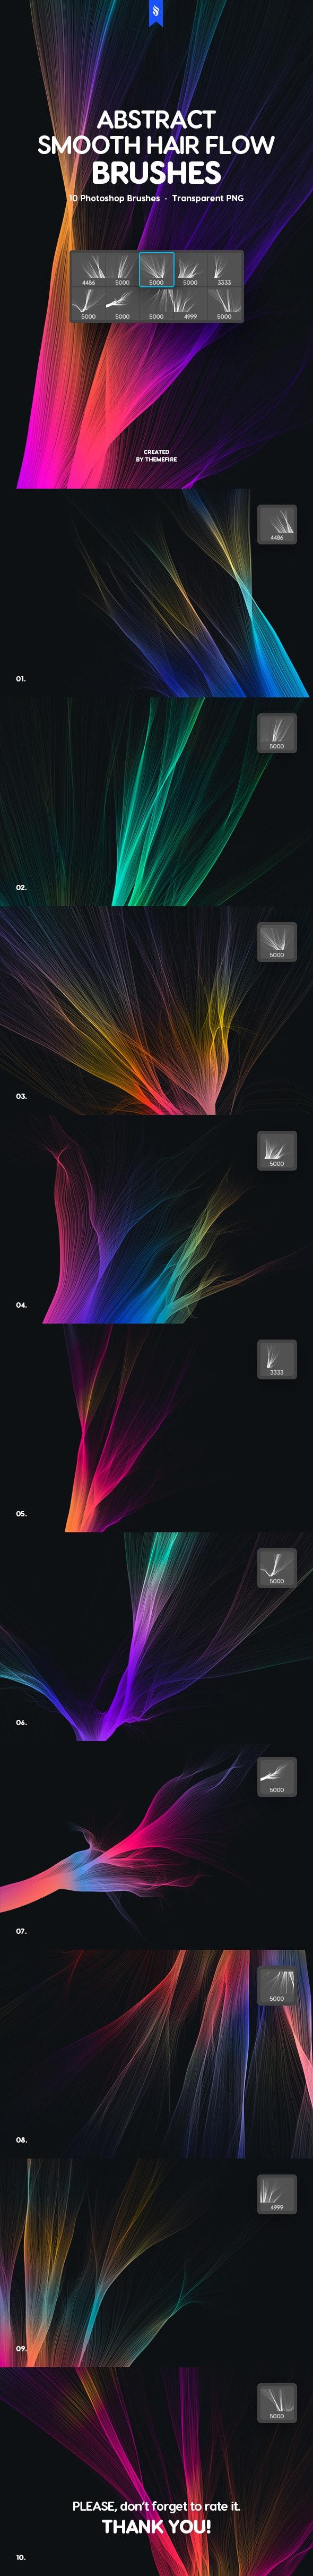 Smooth Hair Flow Photoshop Brushes - Techno / Futuristic Brushes